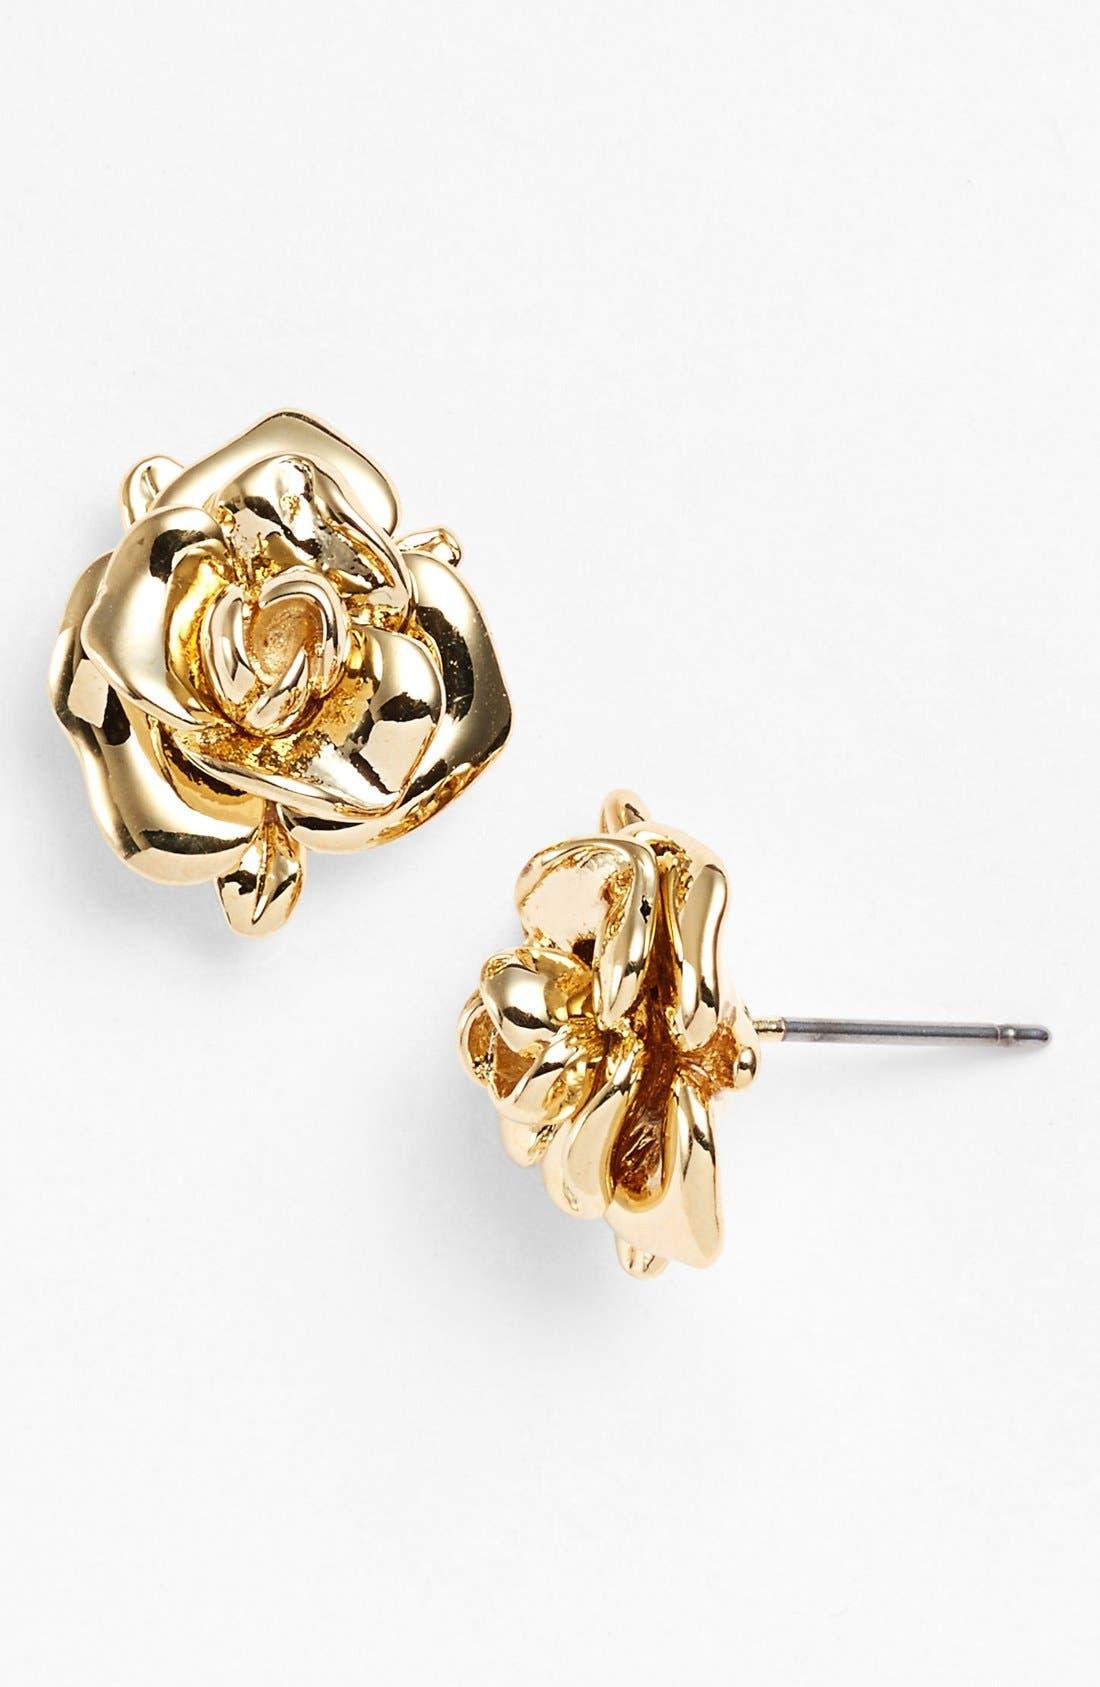 Alternate Image 1 Selected - MARC BY MARC JACOBS 'Jerrie Rose' Stud Earrings